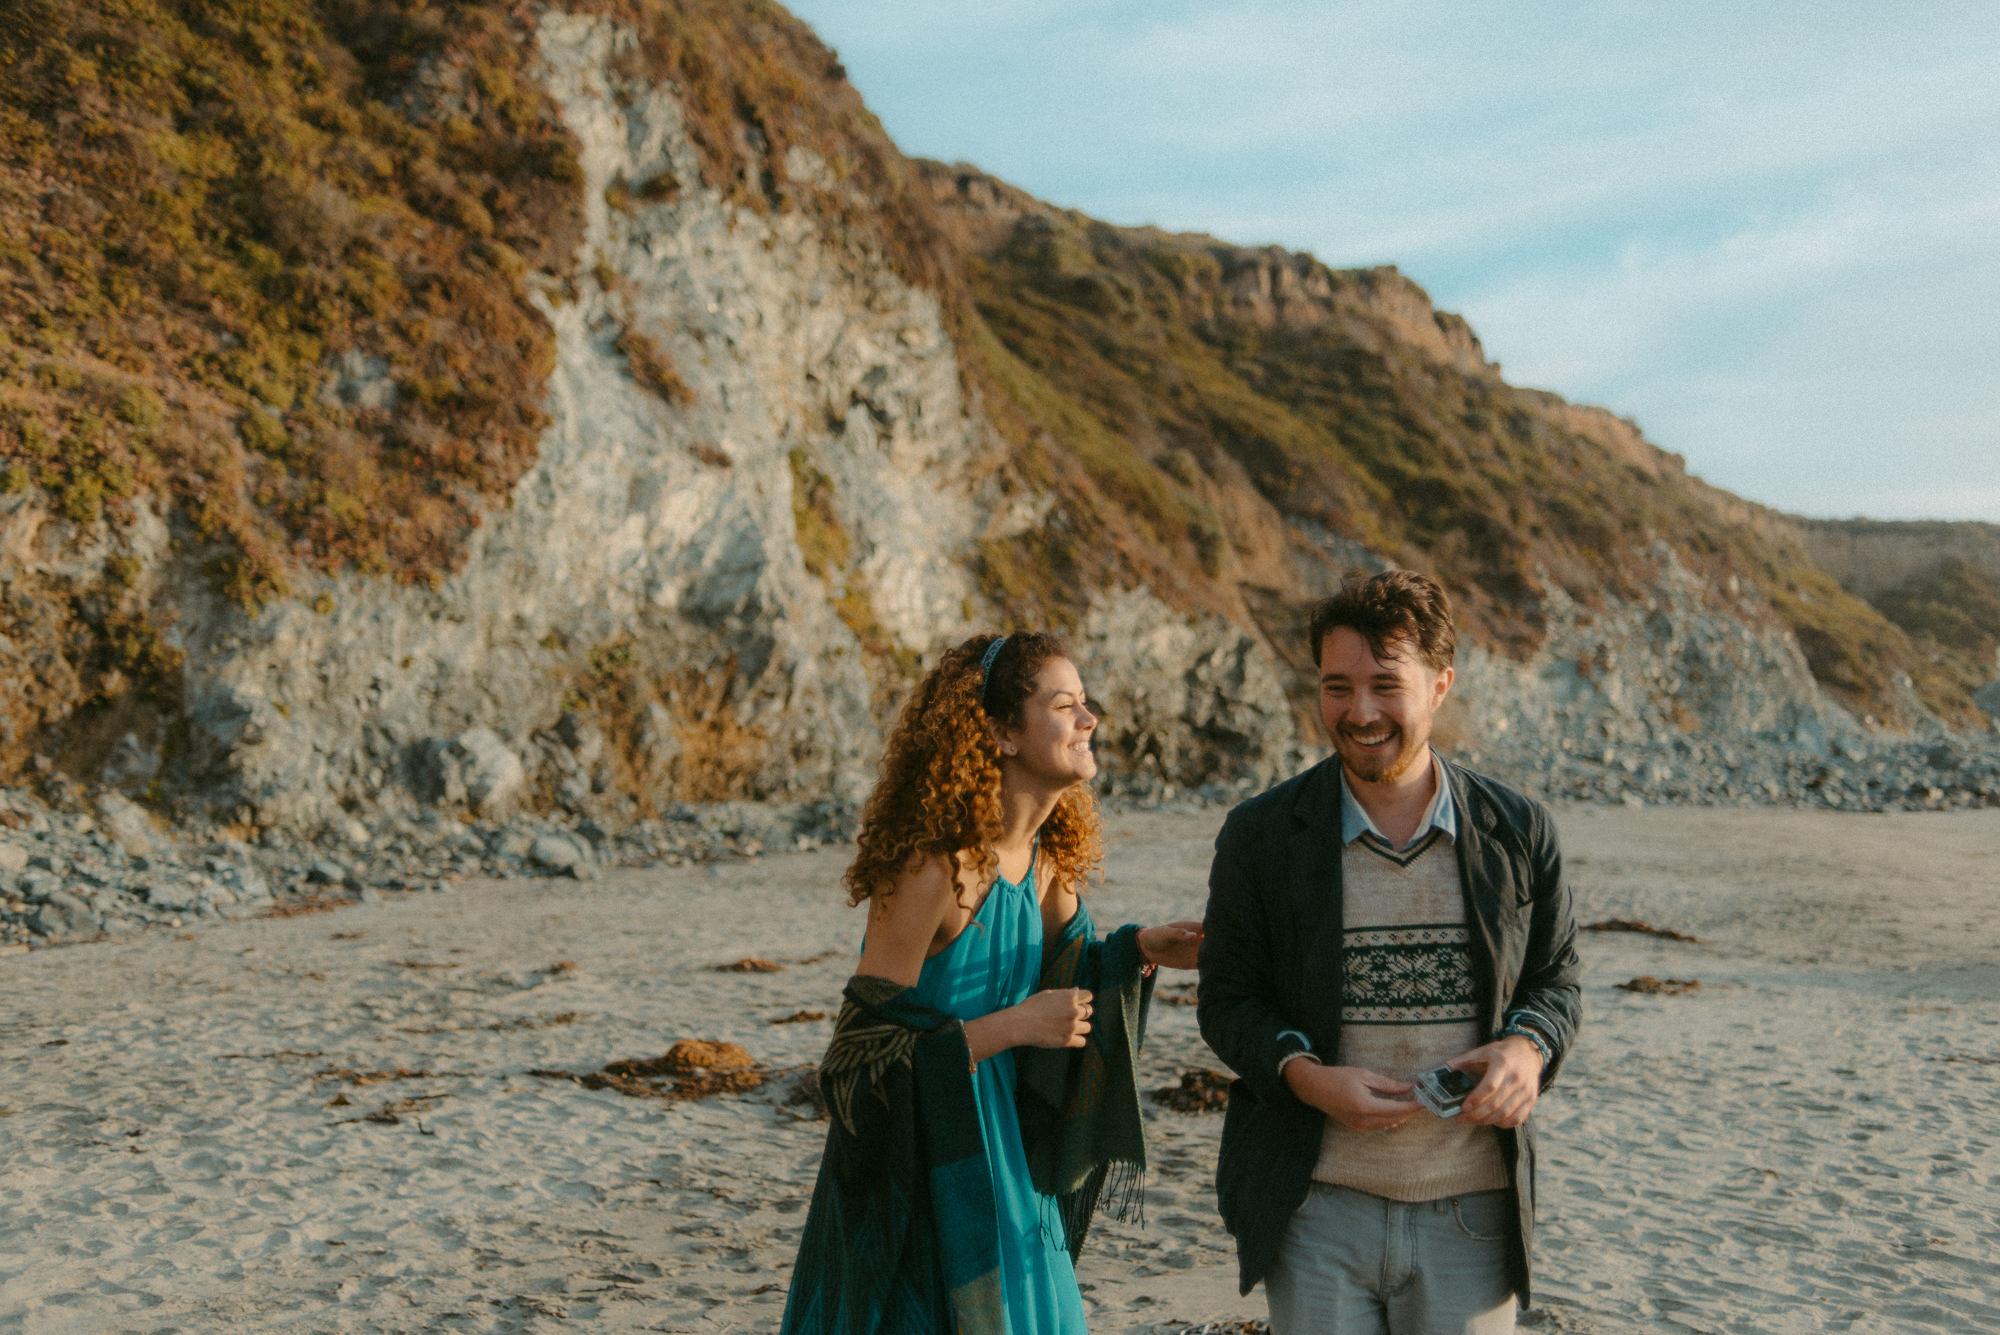 big-sur-adventure-elopement-photographer-96.jpg